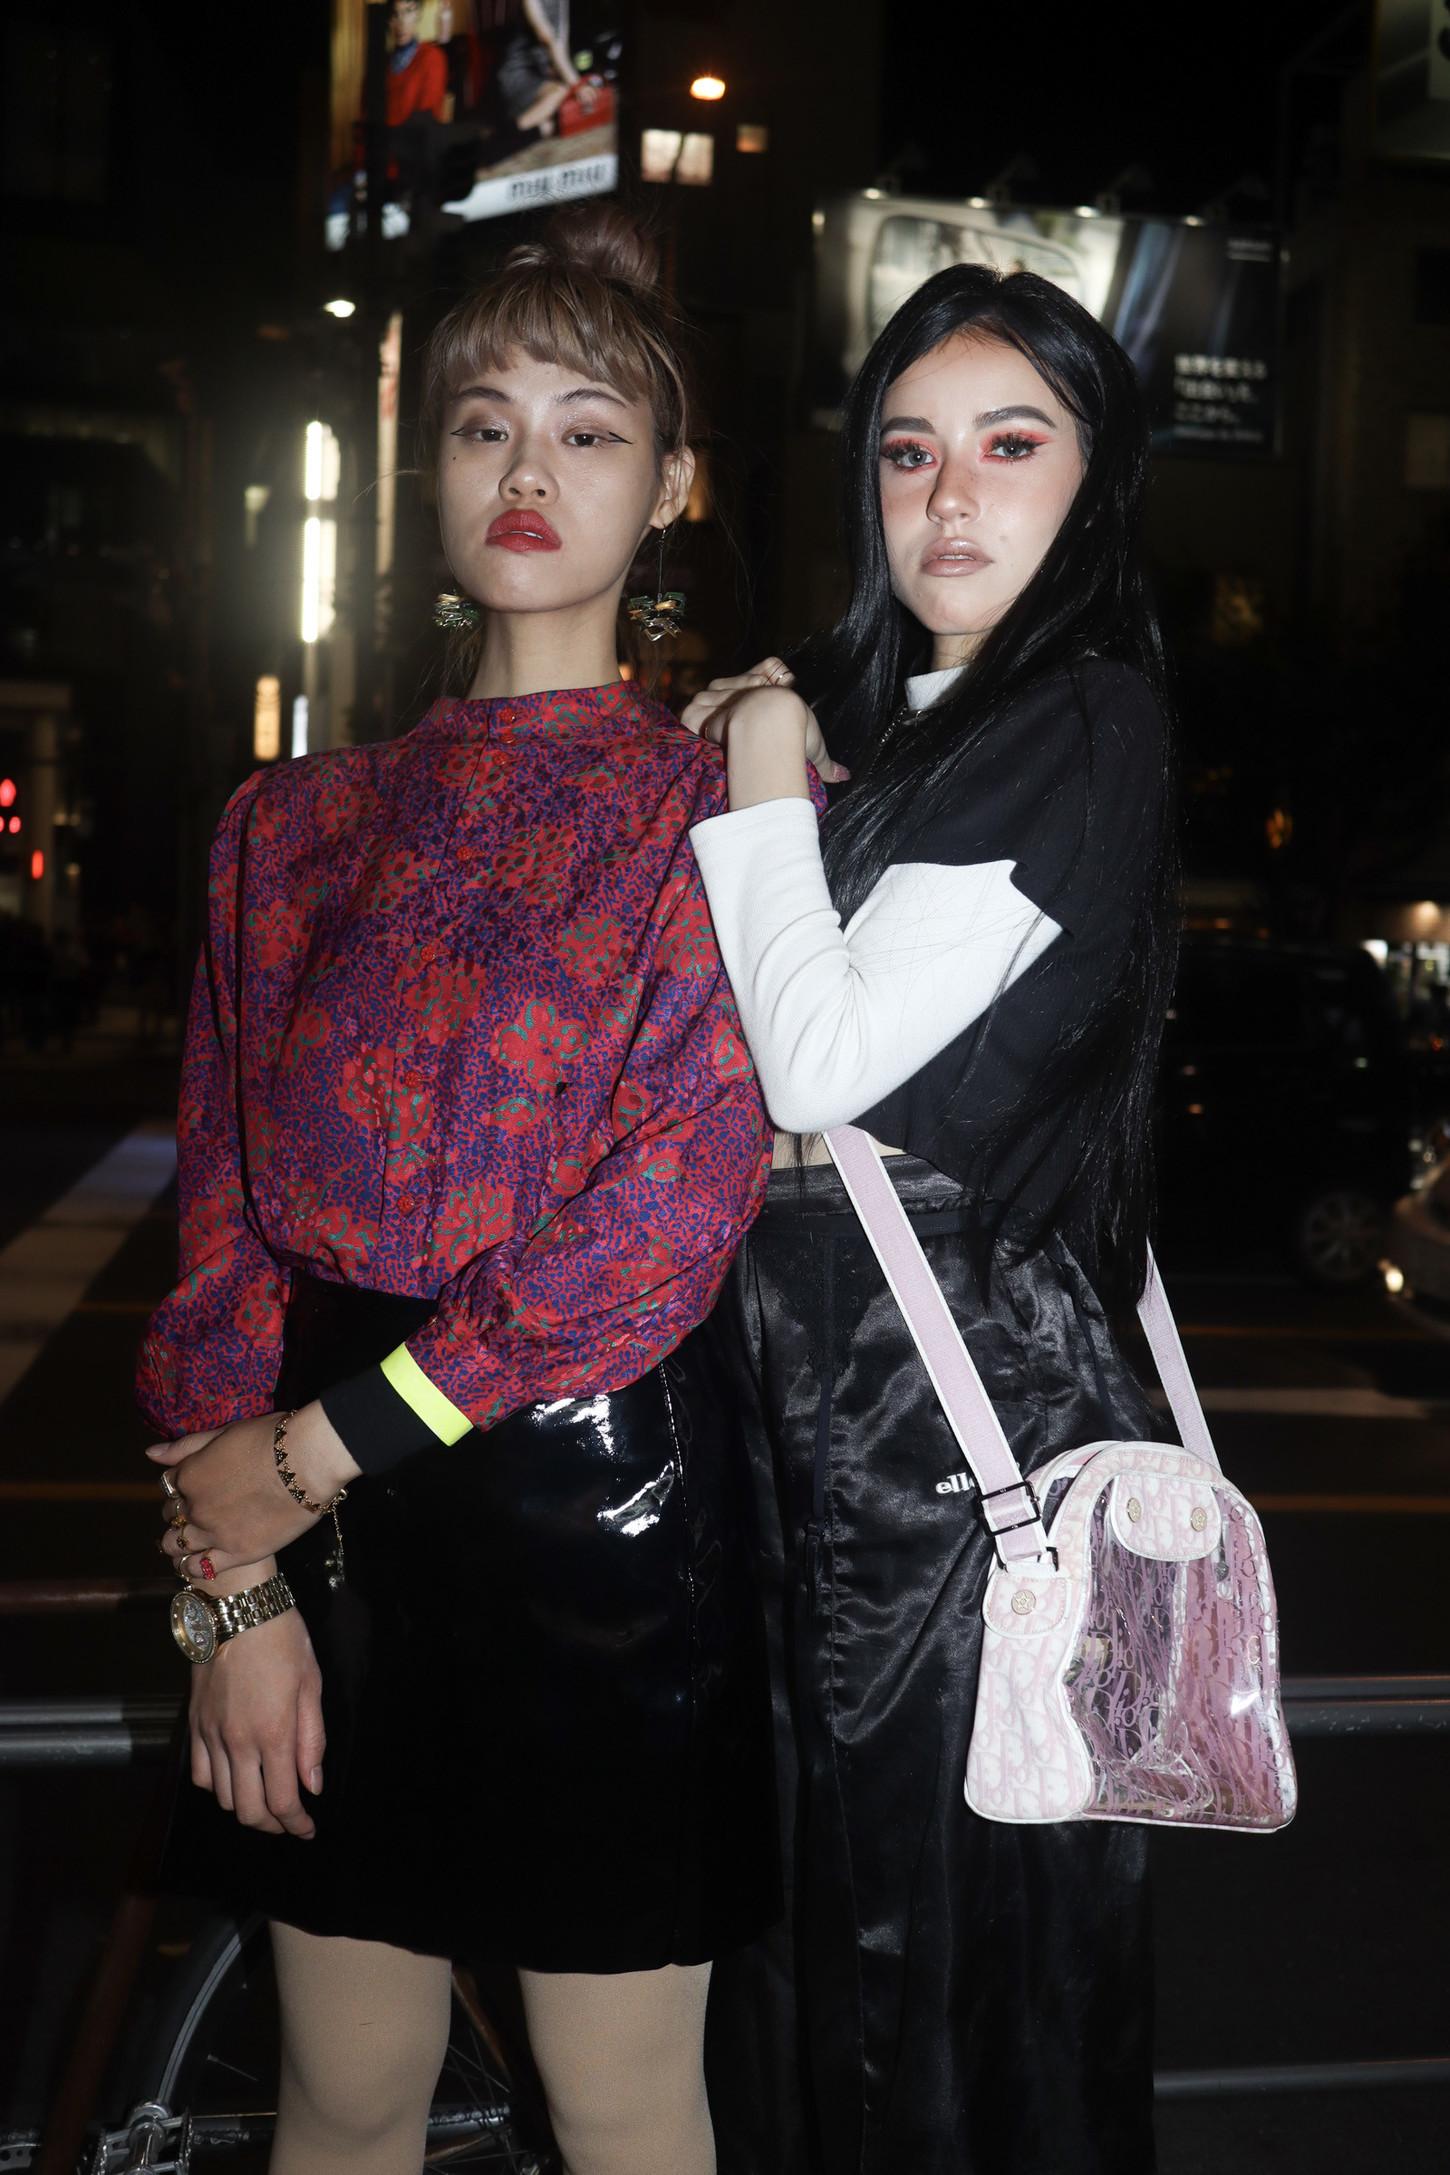 Aline/Tsumire